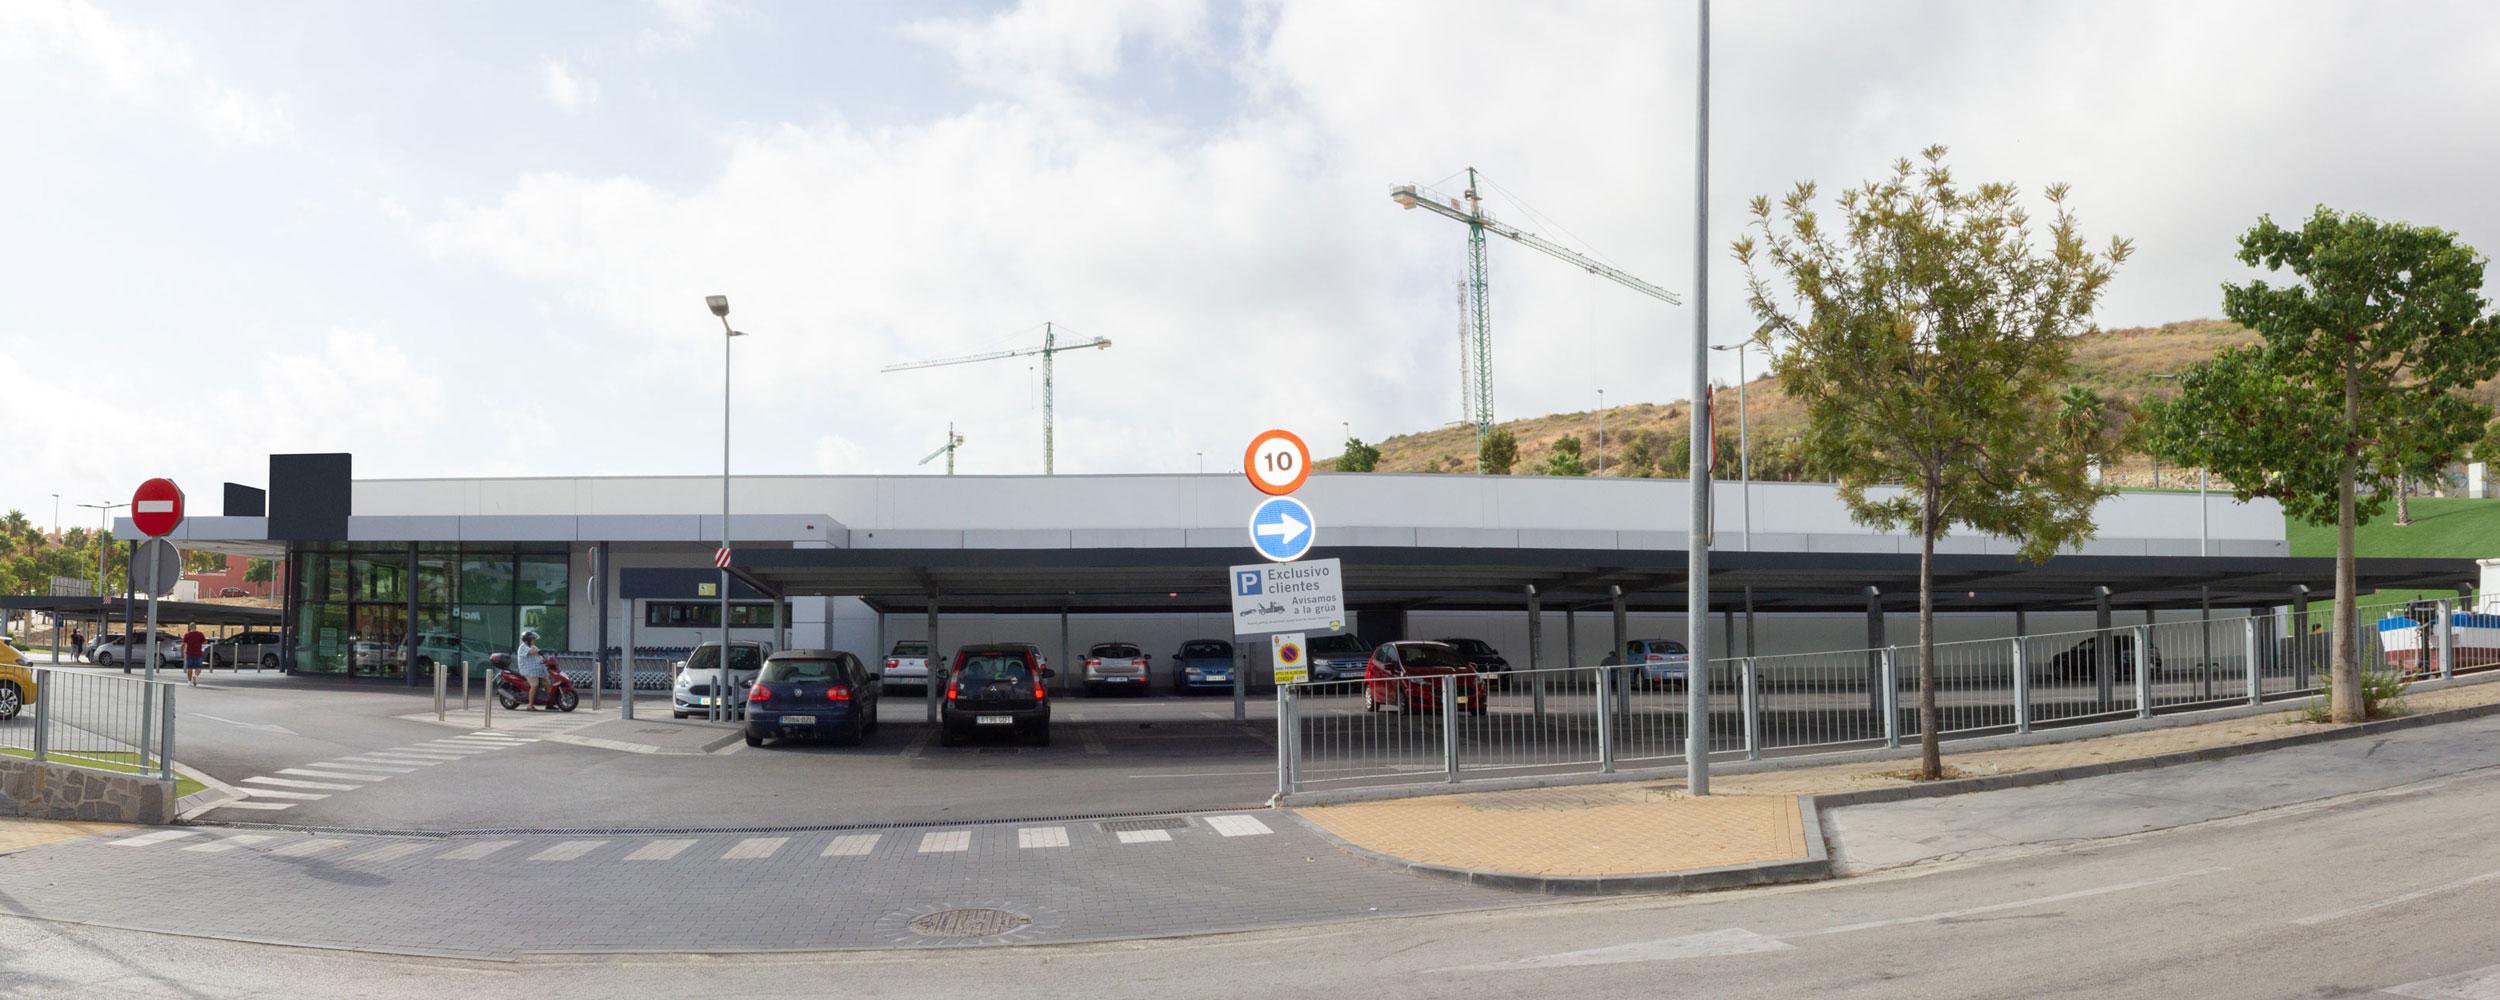 EDIFICIO COMERCIAL - GETARES, ALGECIRAS